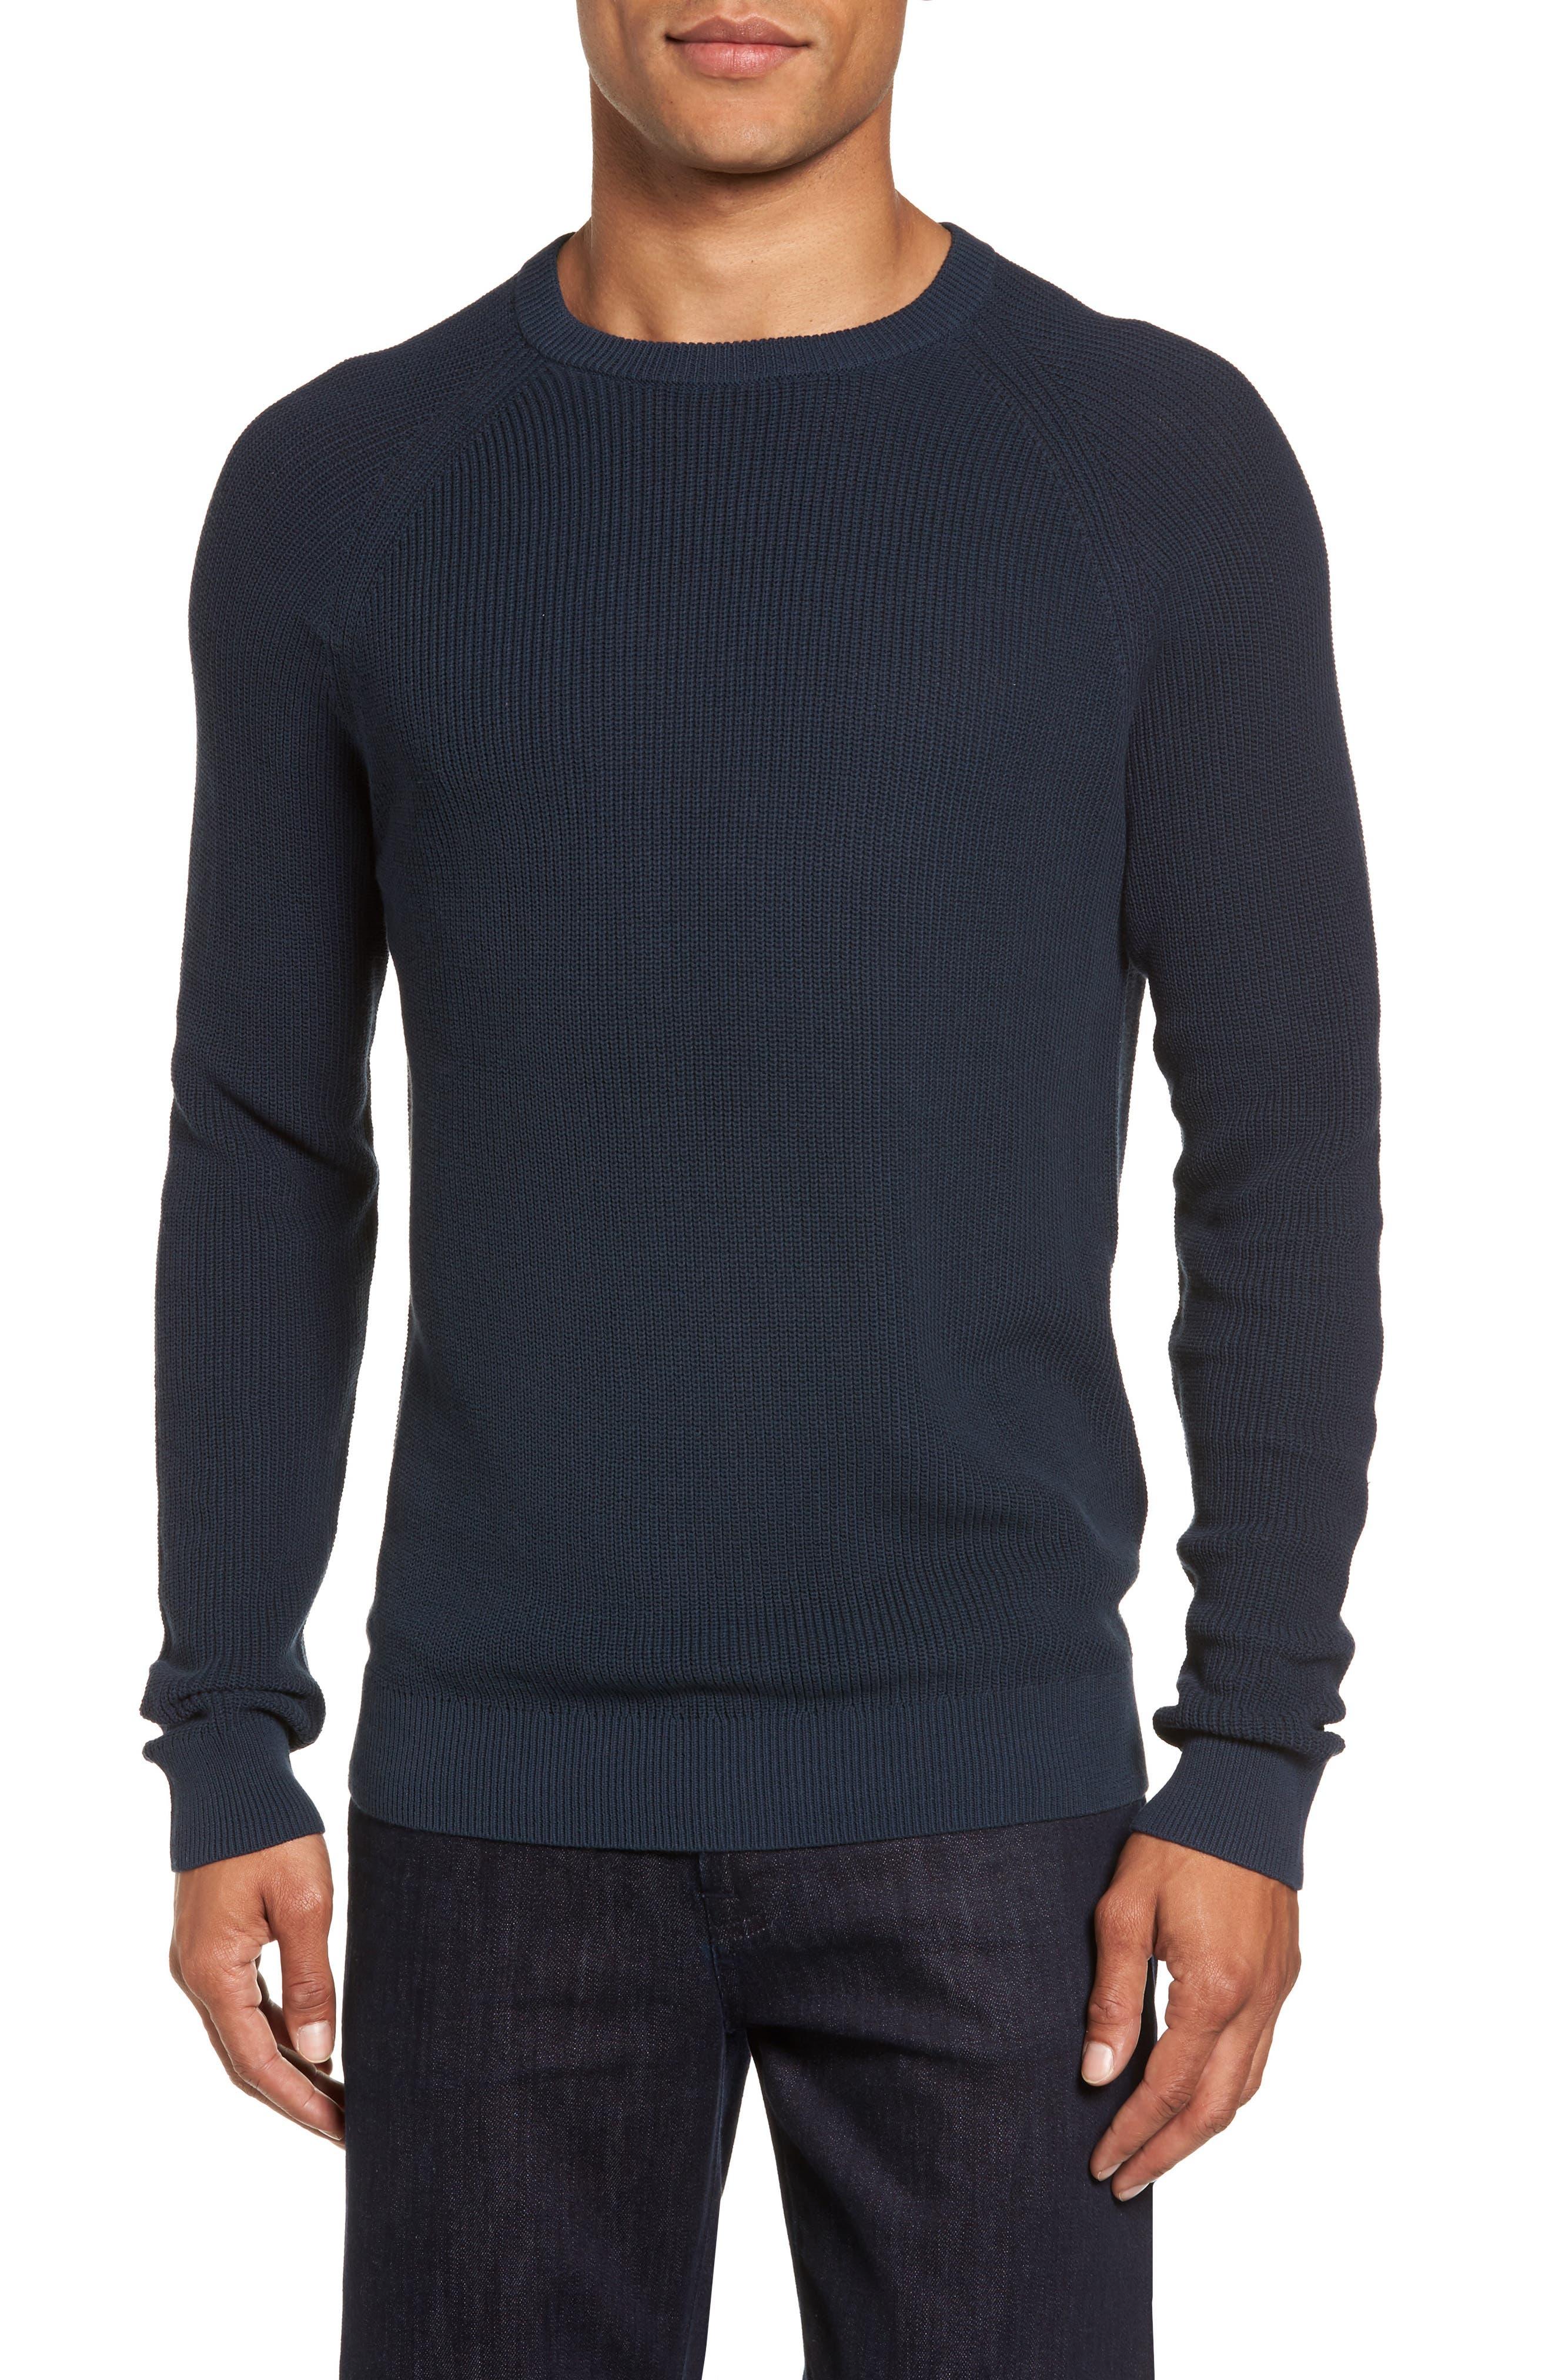 NORDSTROM MENS SHOP Crewneck Sweater